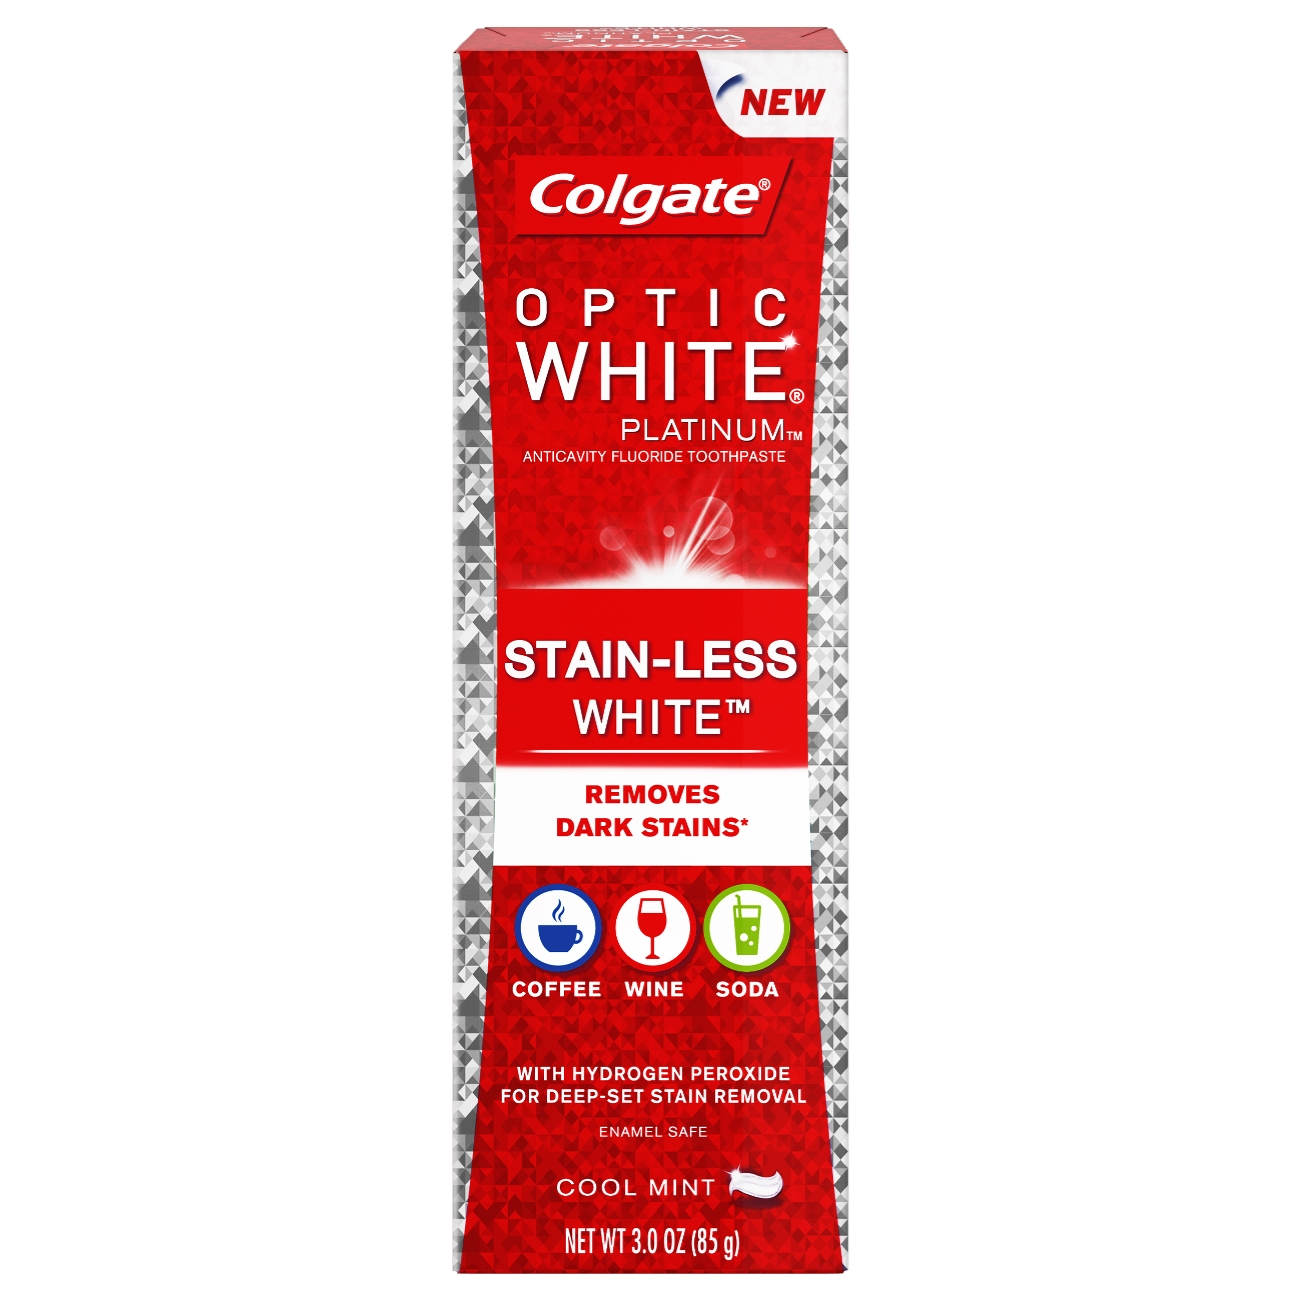 teeth whitening methods colgate toothpaste